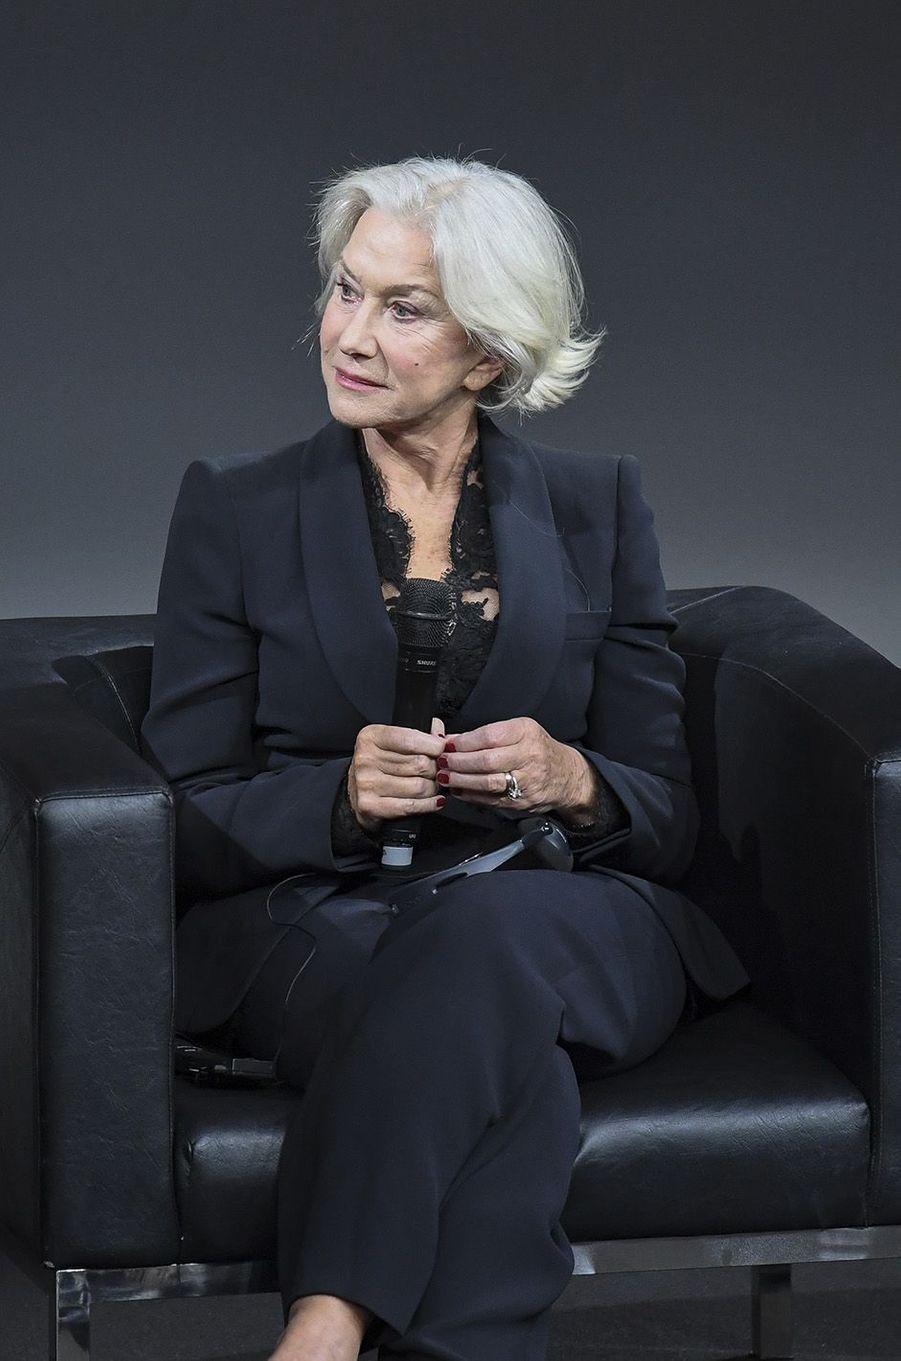 Helen Mirren lors de la conférence de presse Pirelli.